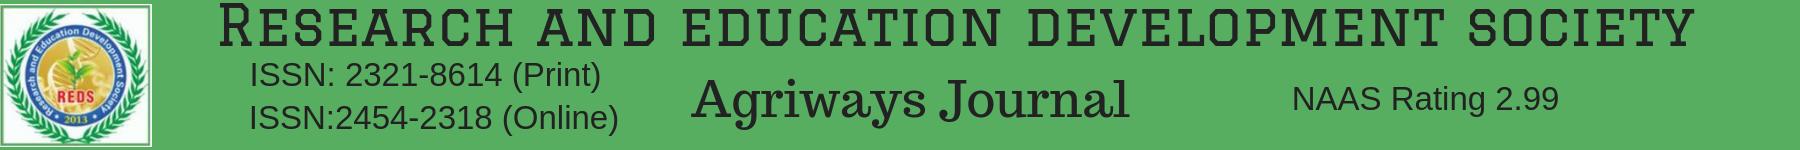 agriwaysjournal